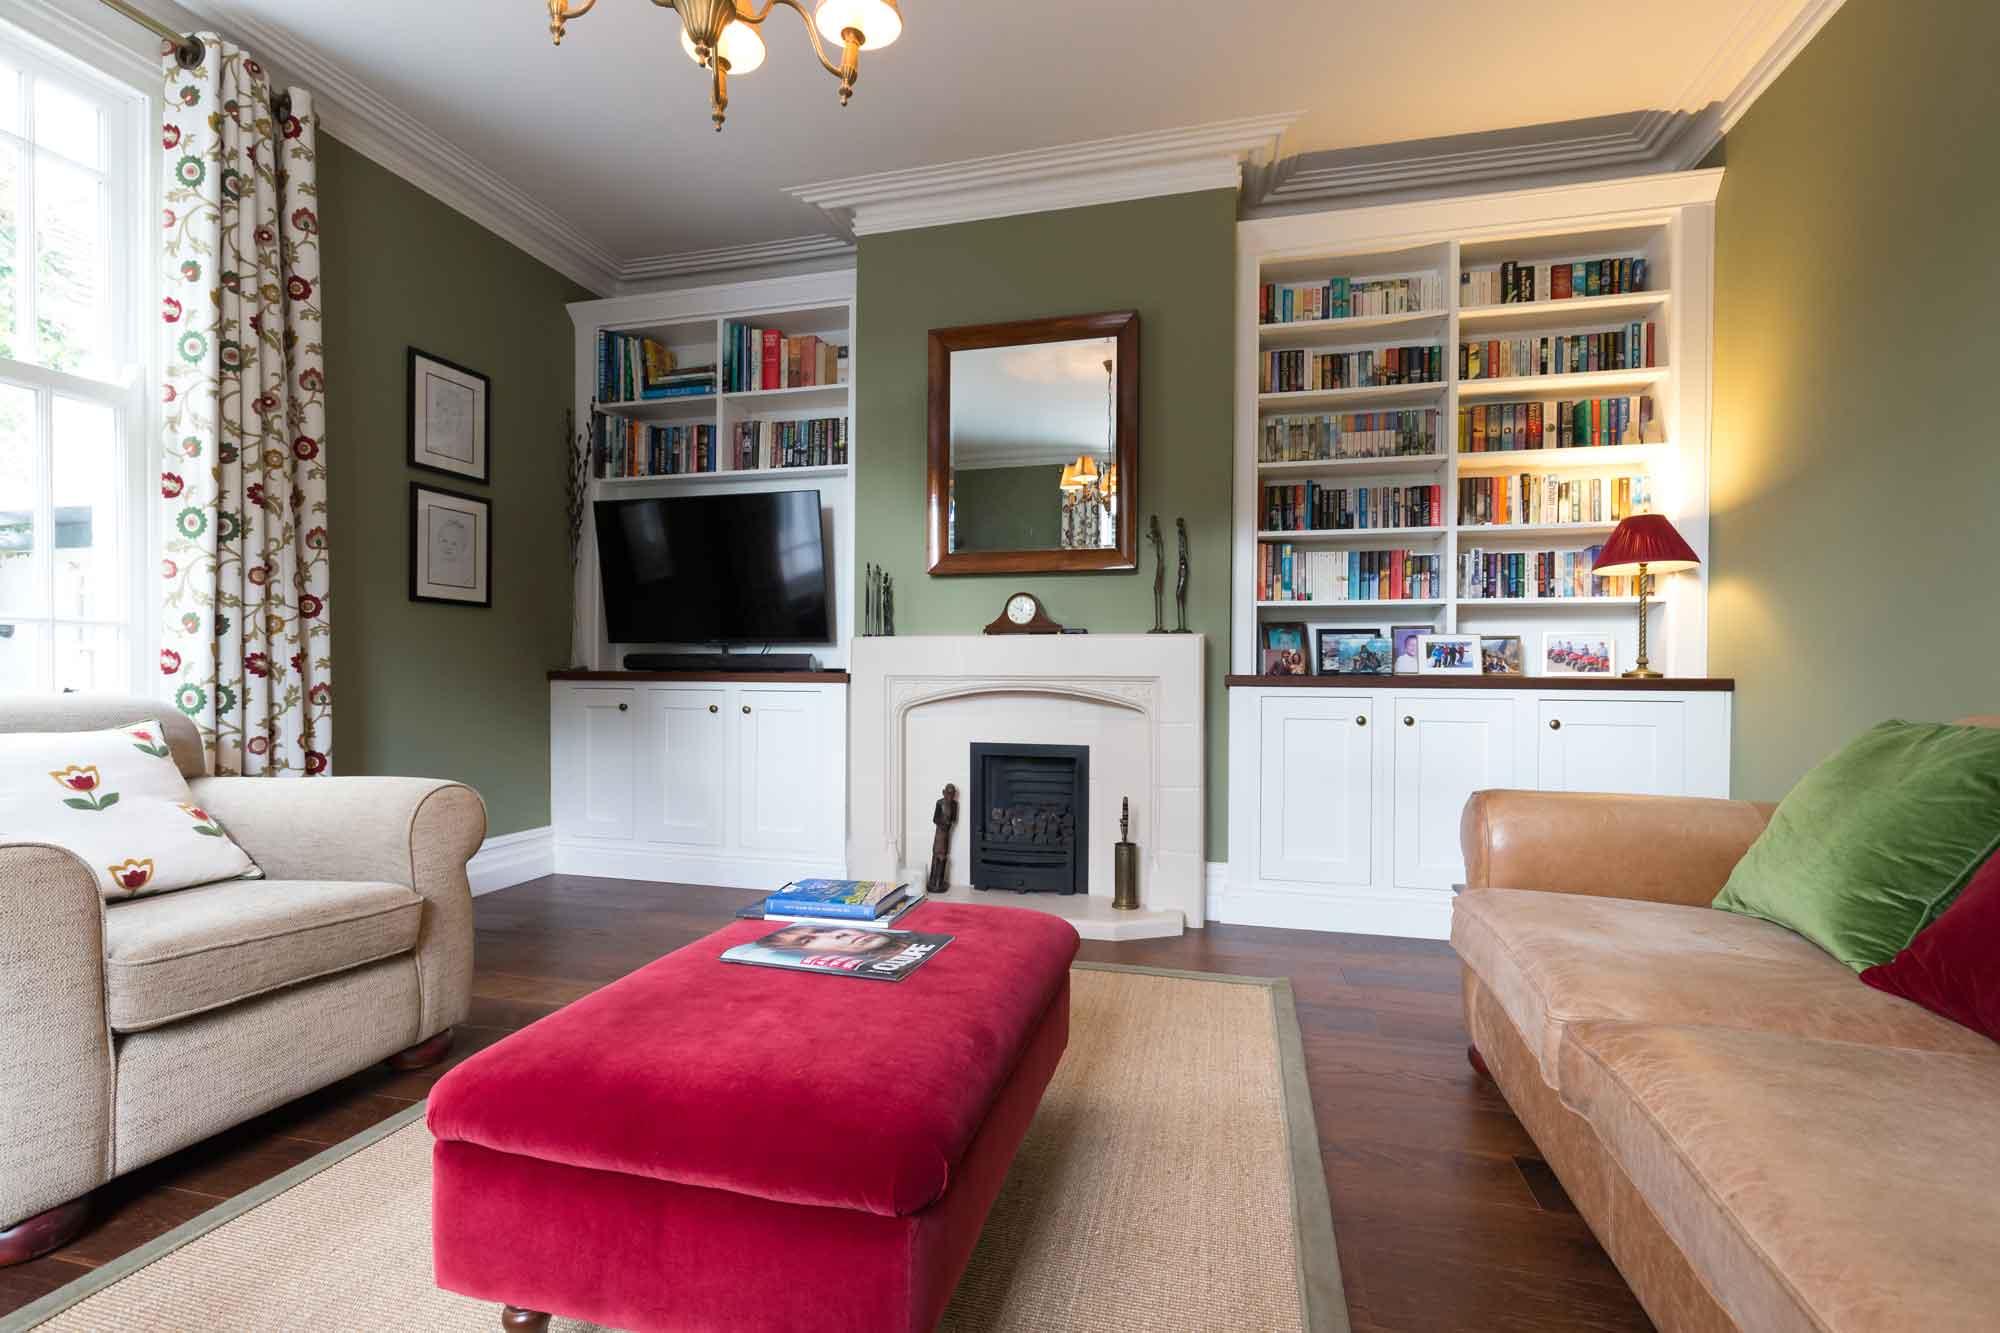 hardwood flooring, fireplace, bookcase, cornice, sofa